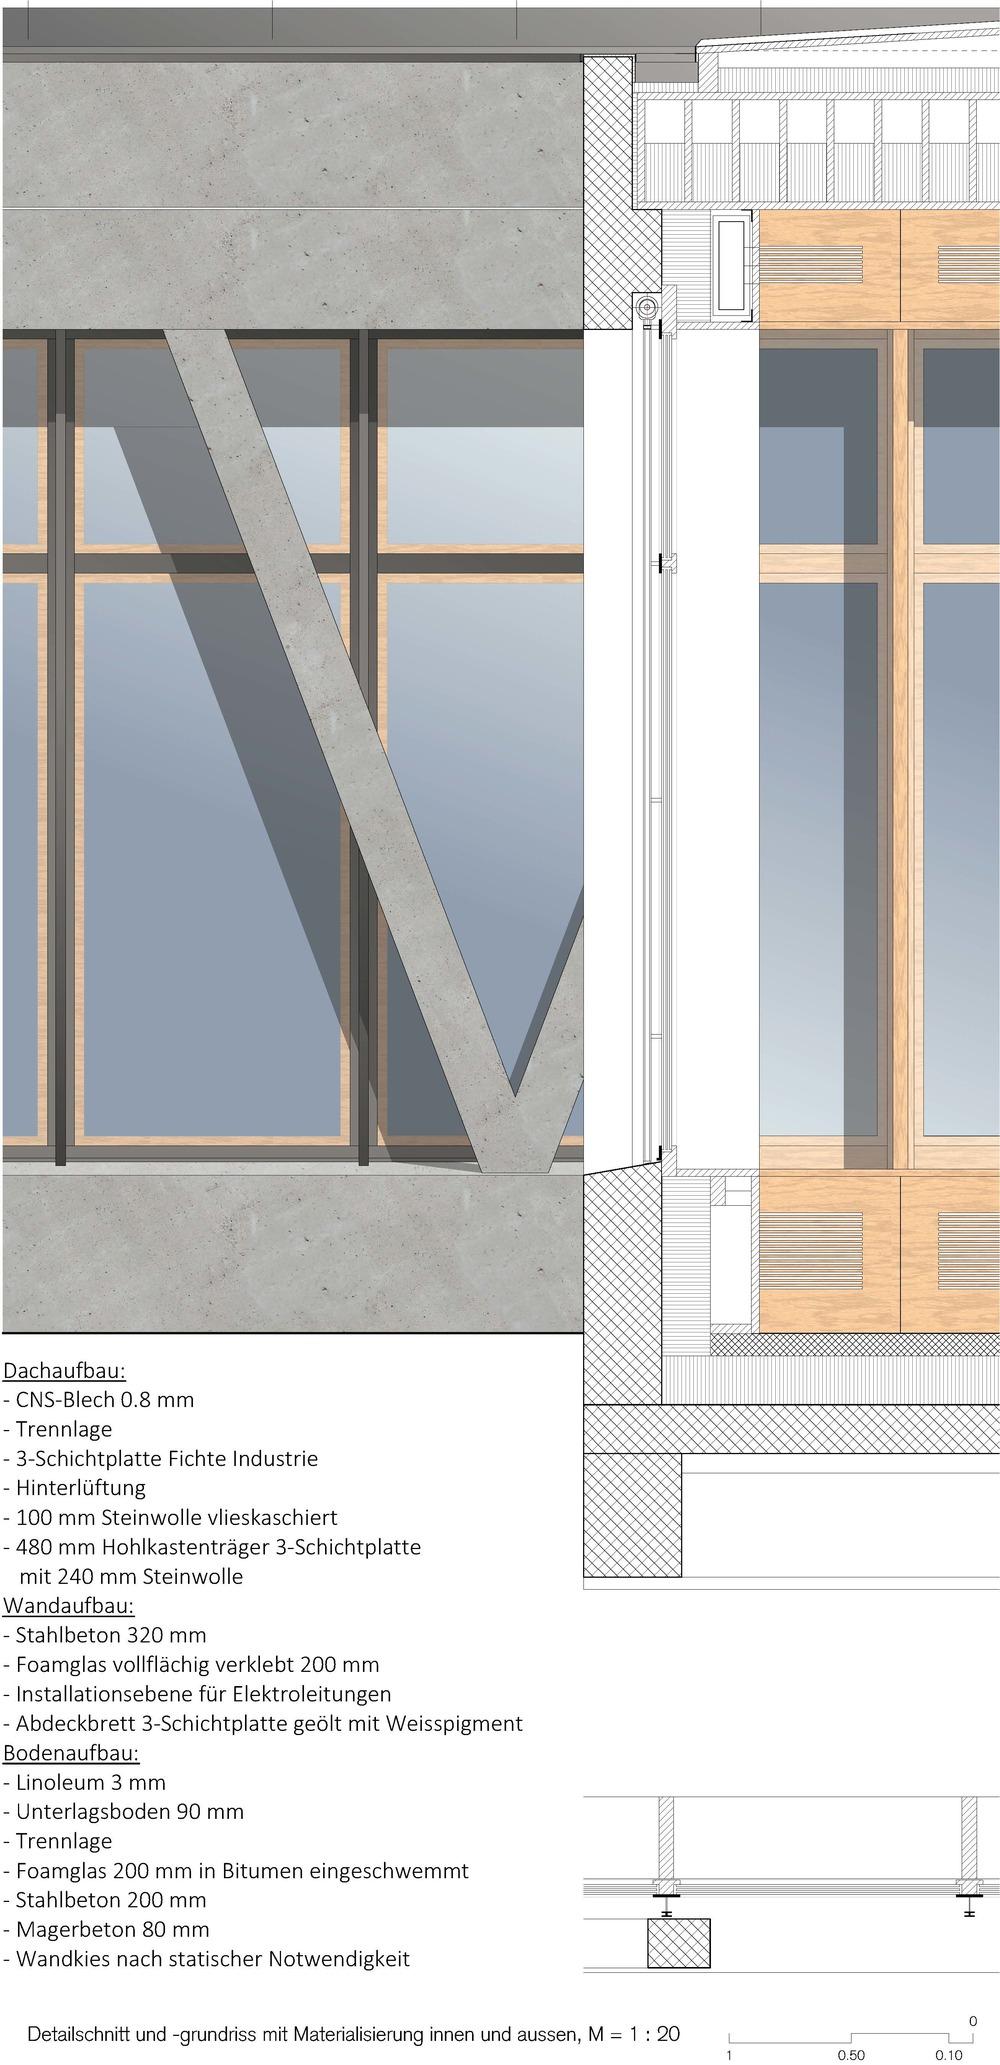 169-5-Fassadendetail.jpg